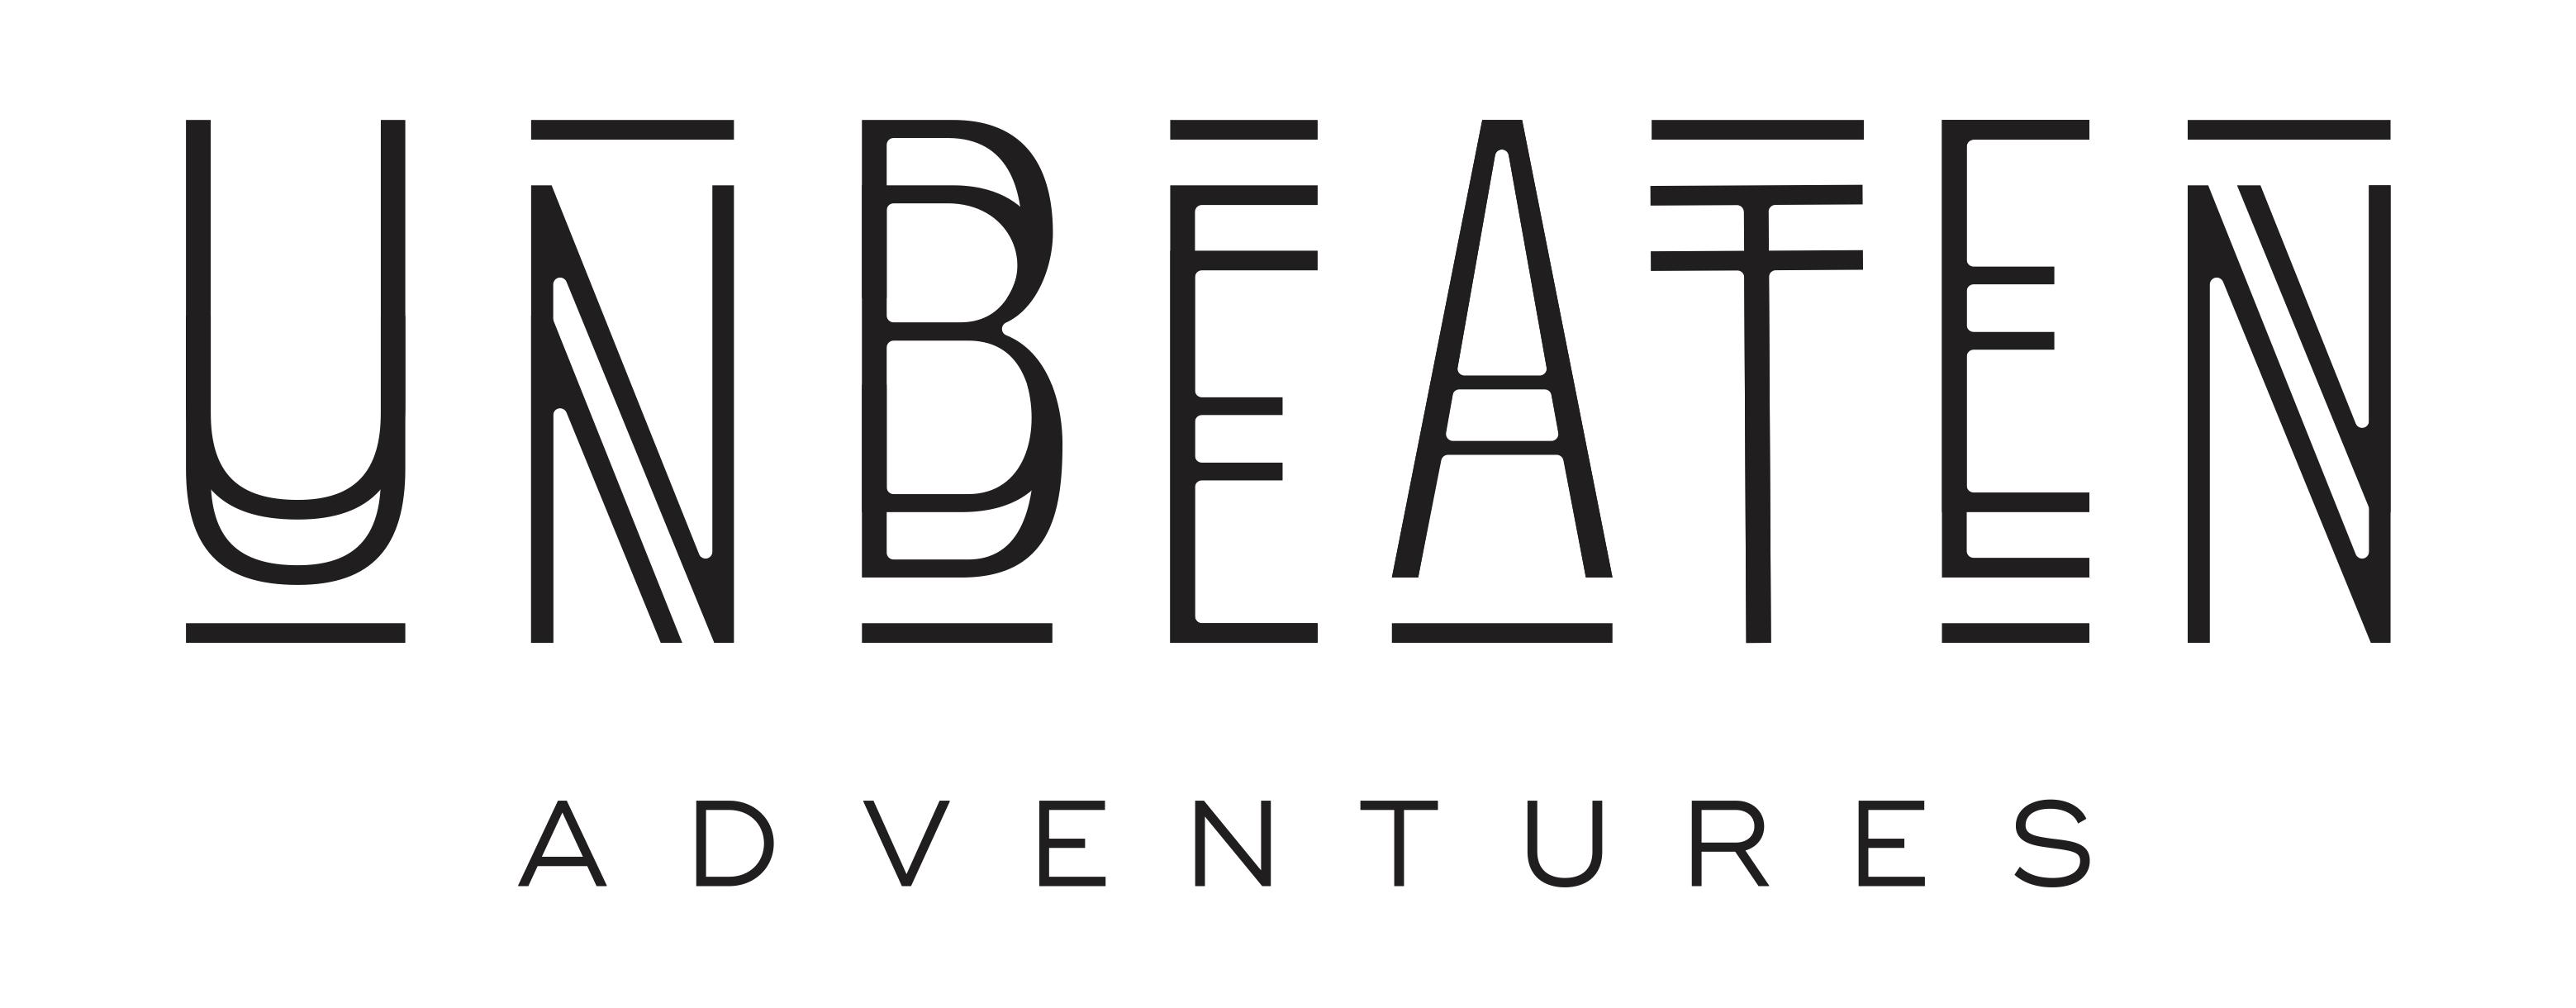 logo Unbeaten adventures mountainbike vakantie